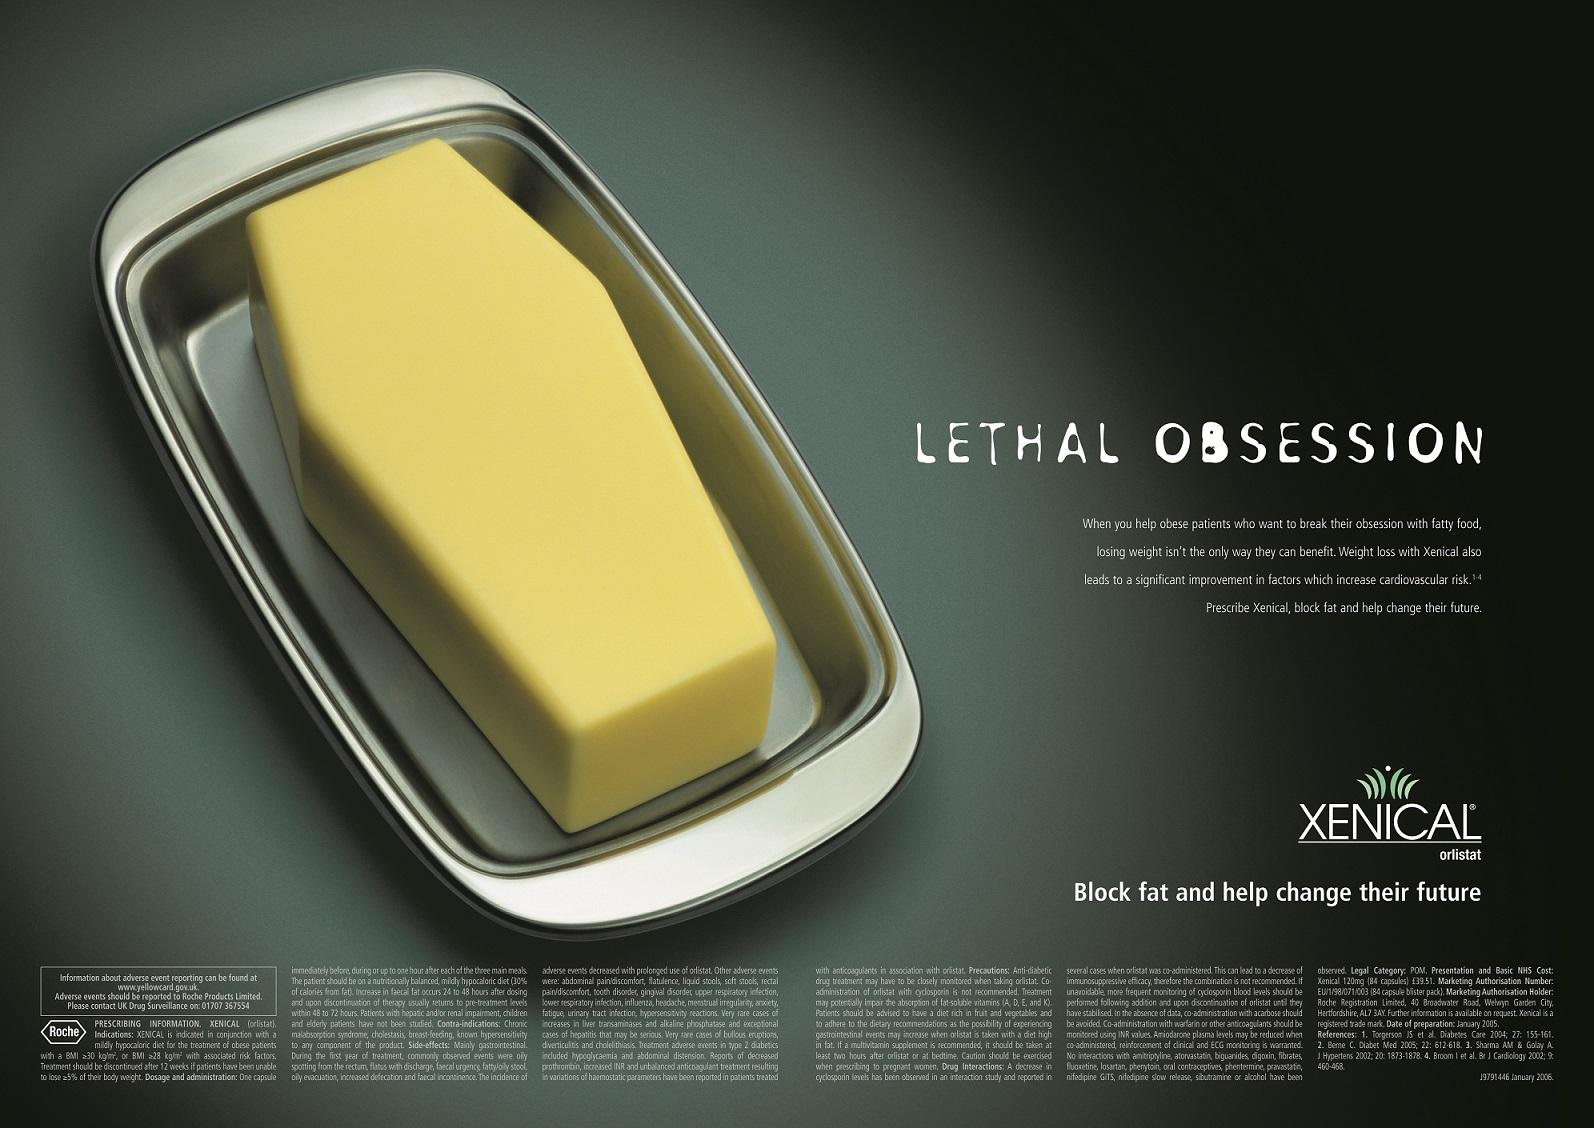 xenical-butter